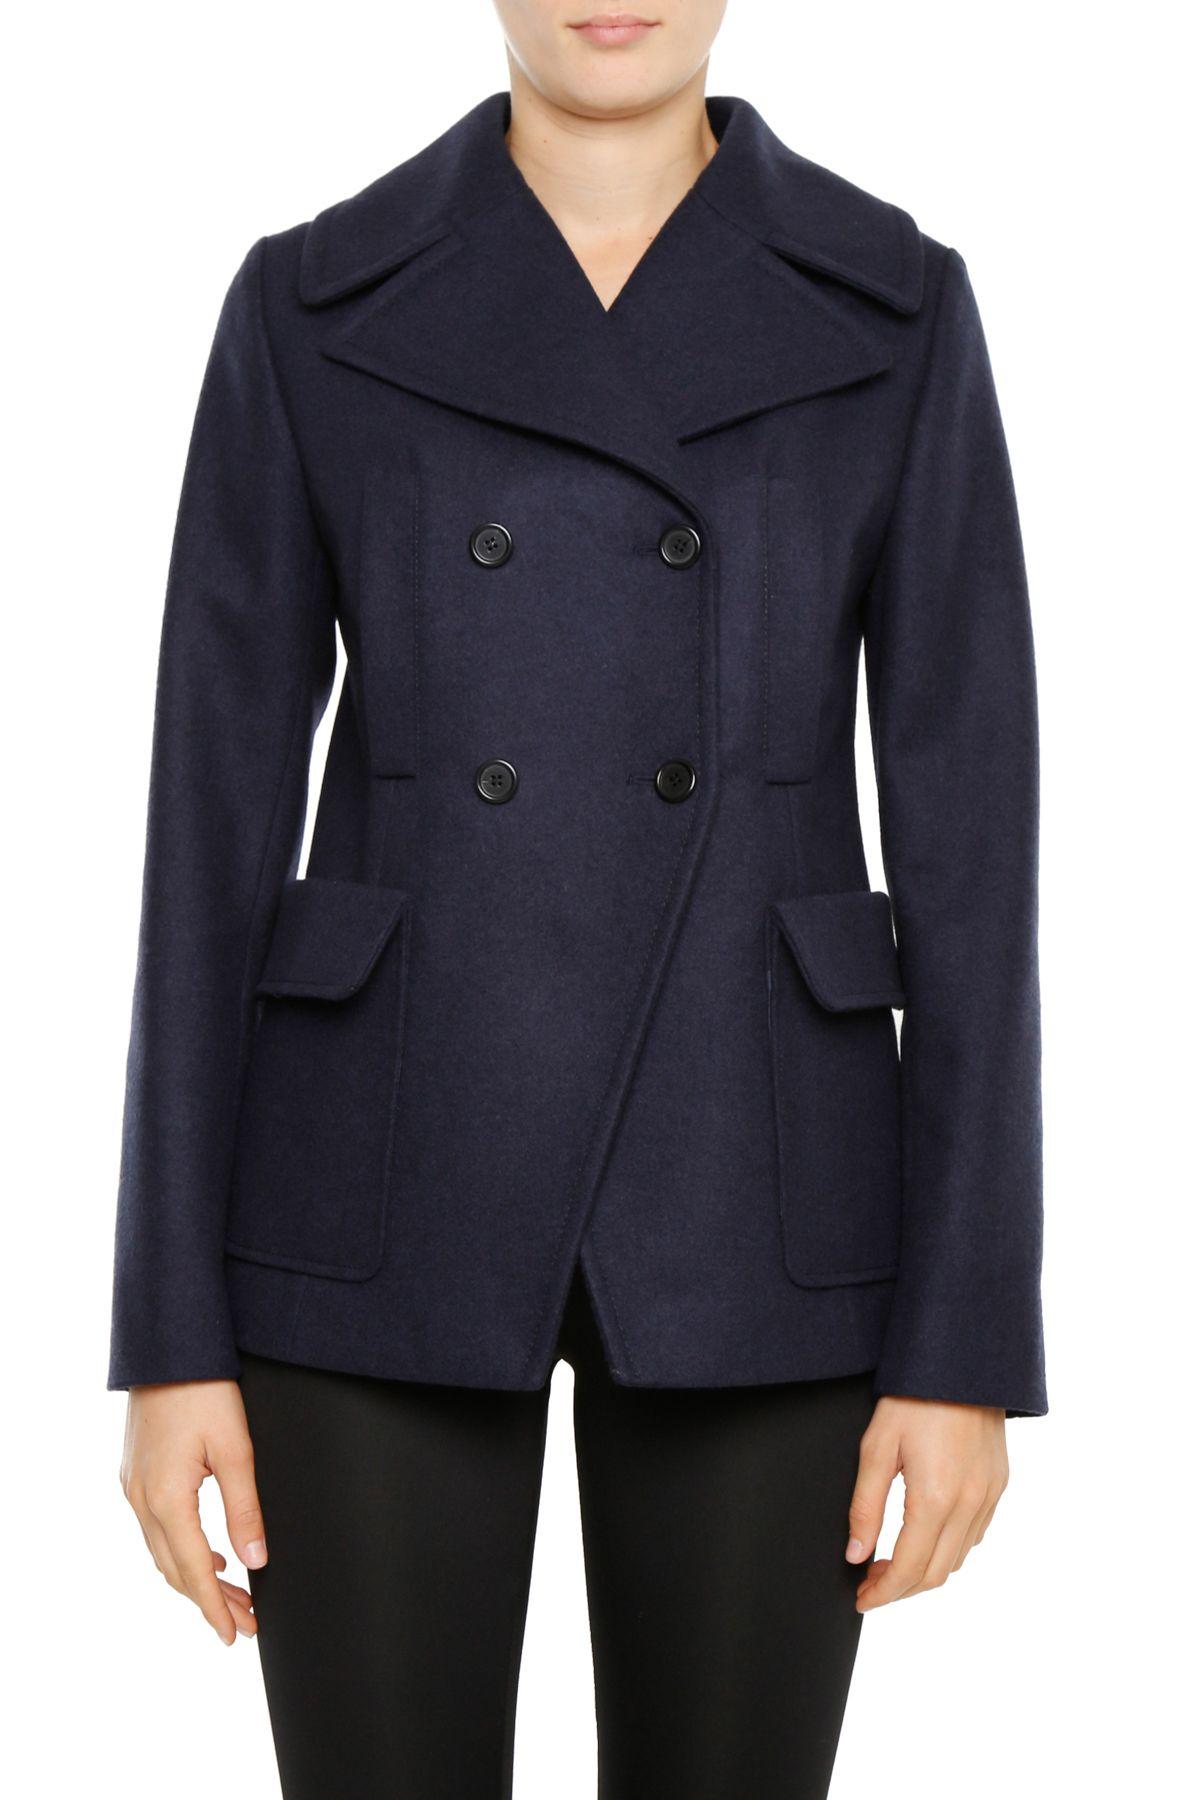 Brilliant Youtobin Womenu0026#39;s New Style Winter Dress-Coats Slim Long Woolen Pea Coat | Pricer Pro - The Best ...